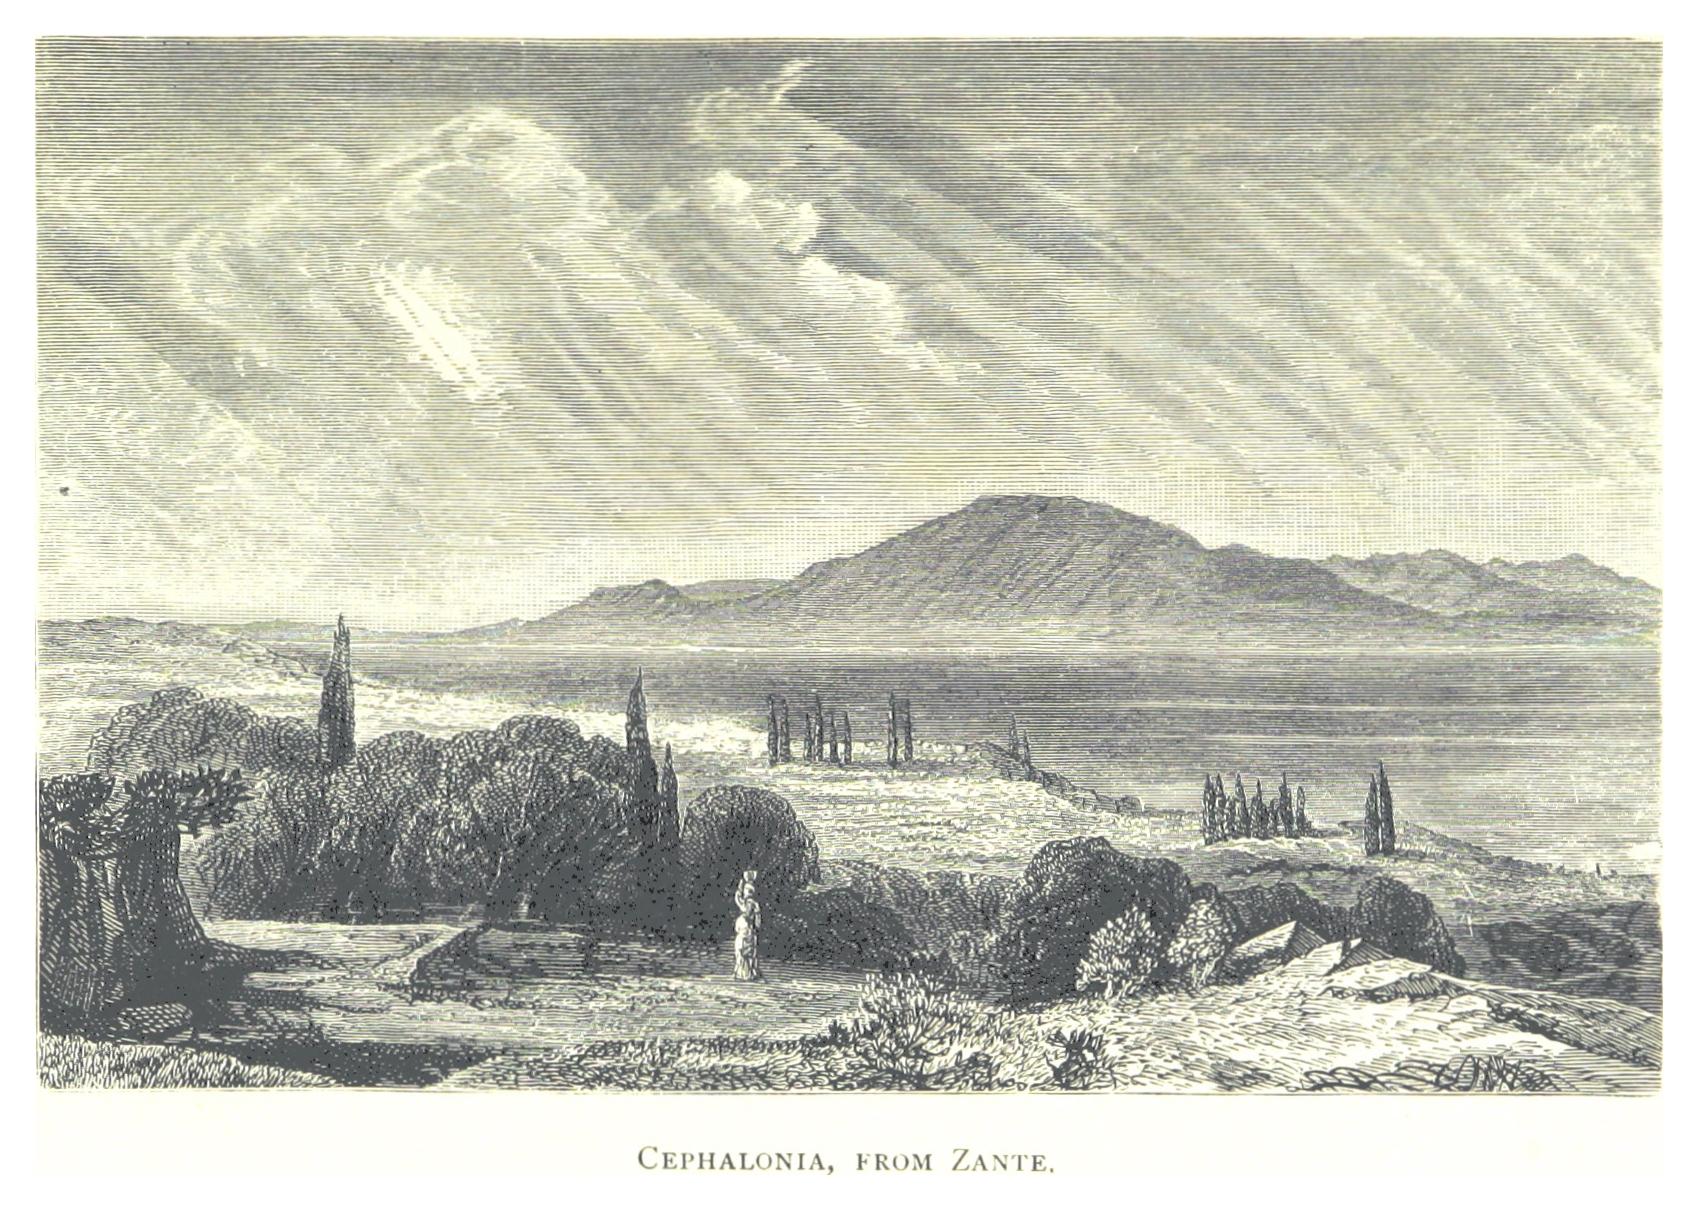 farrer-1882-cephalonia